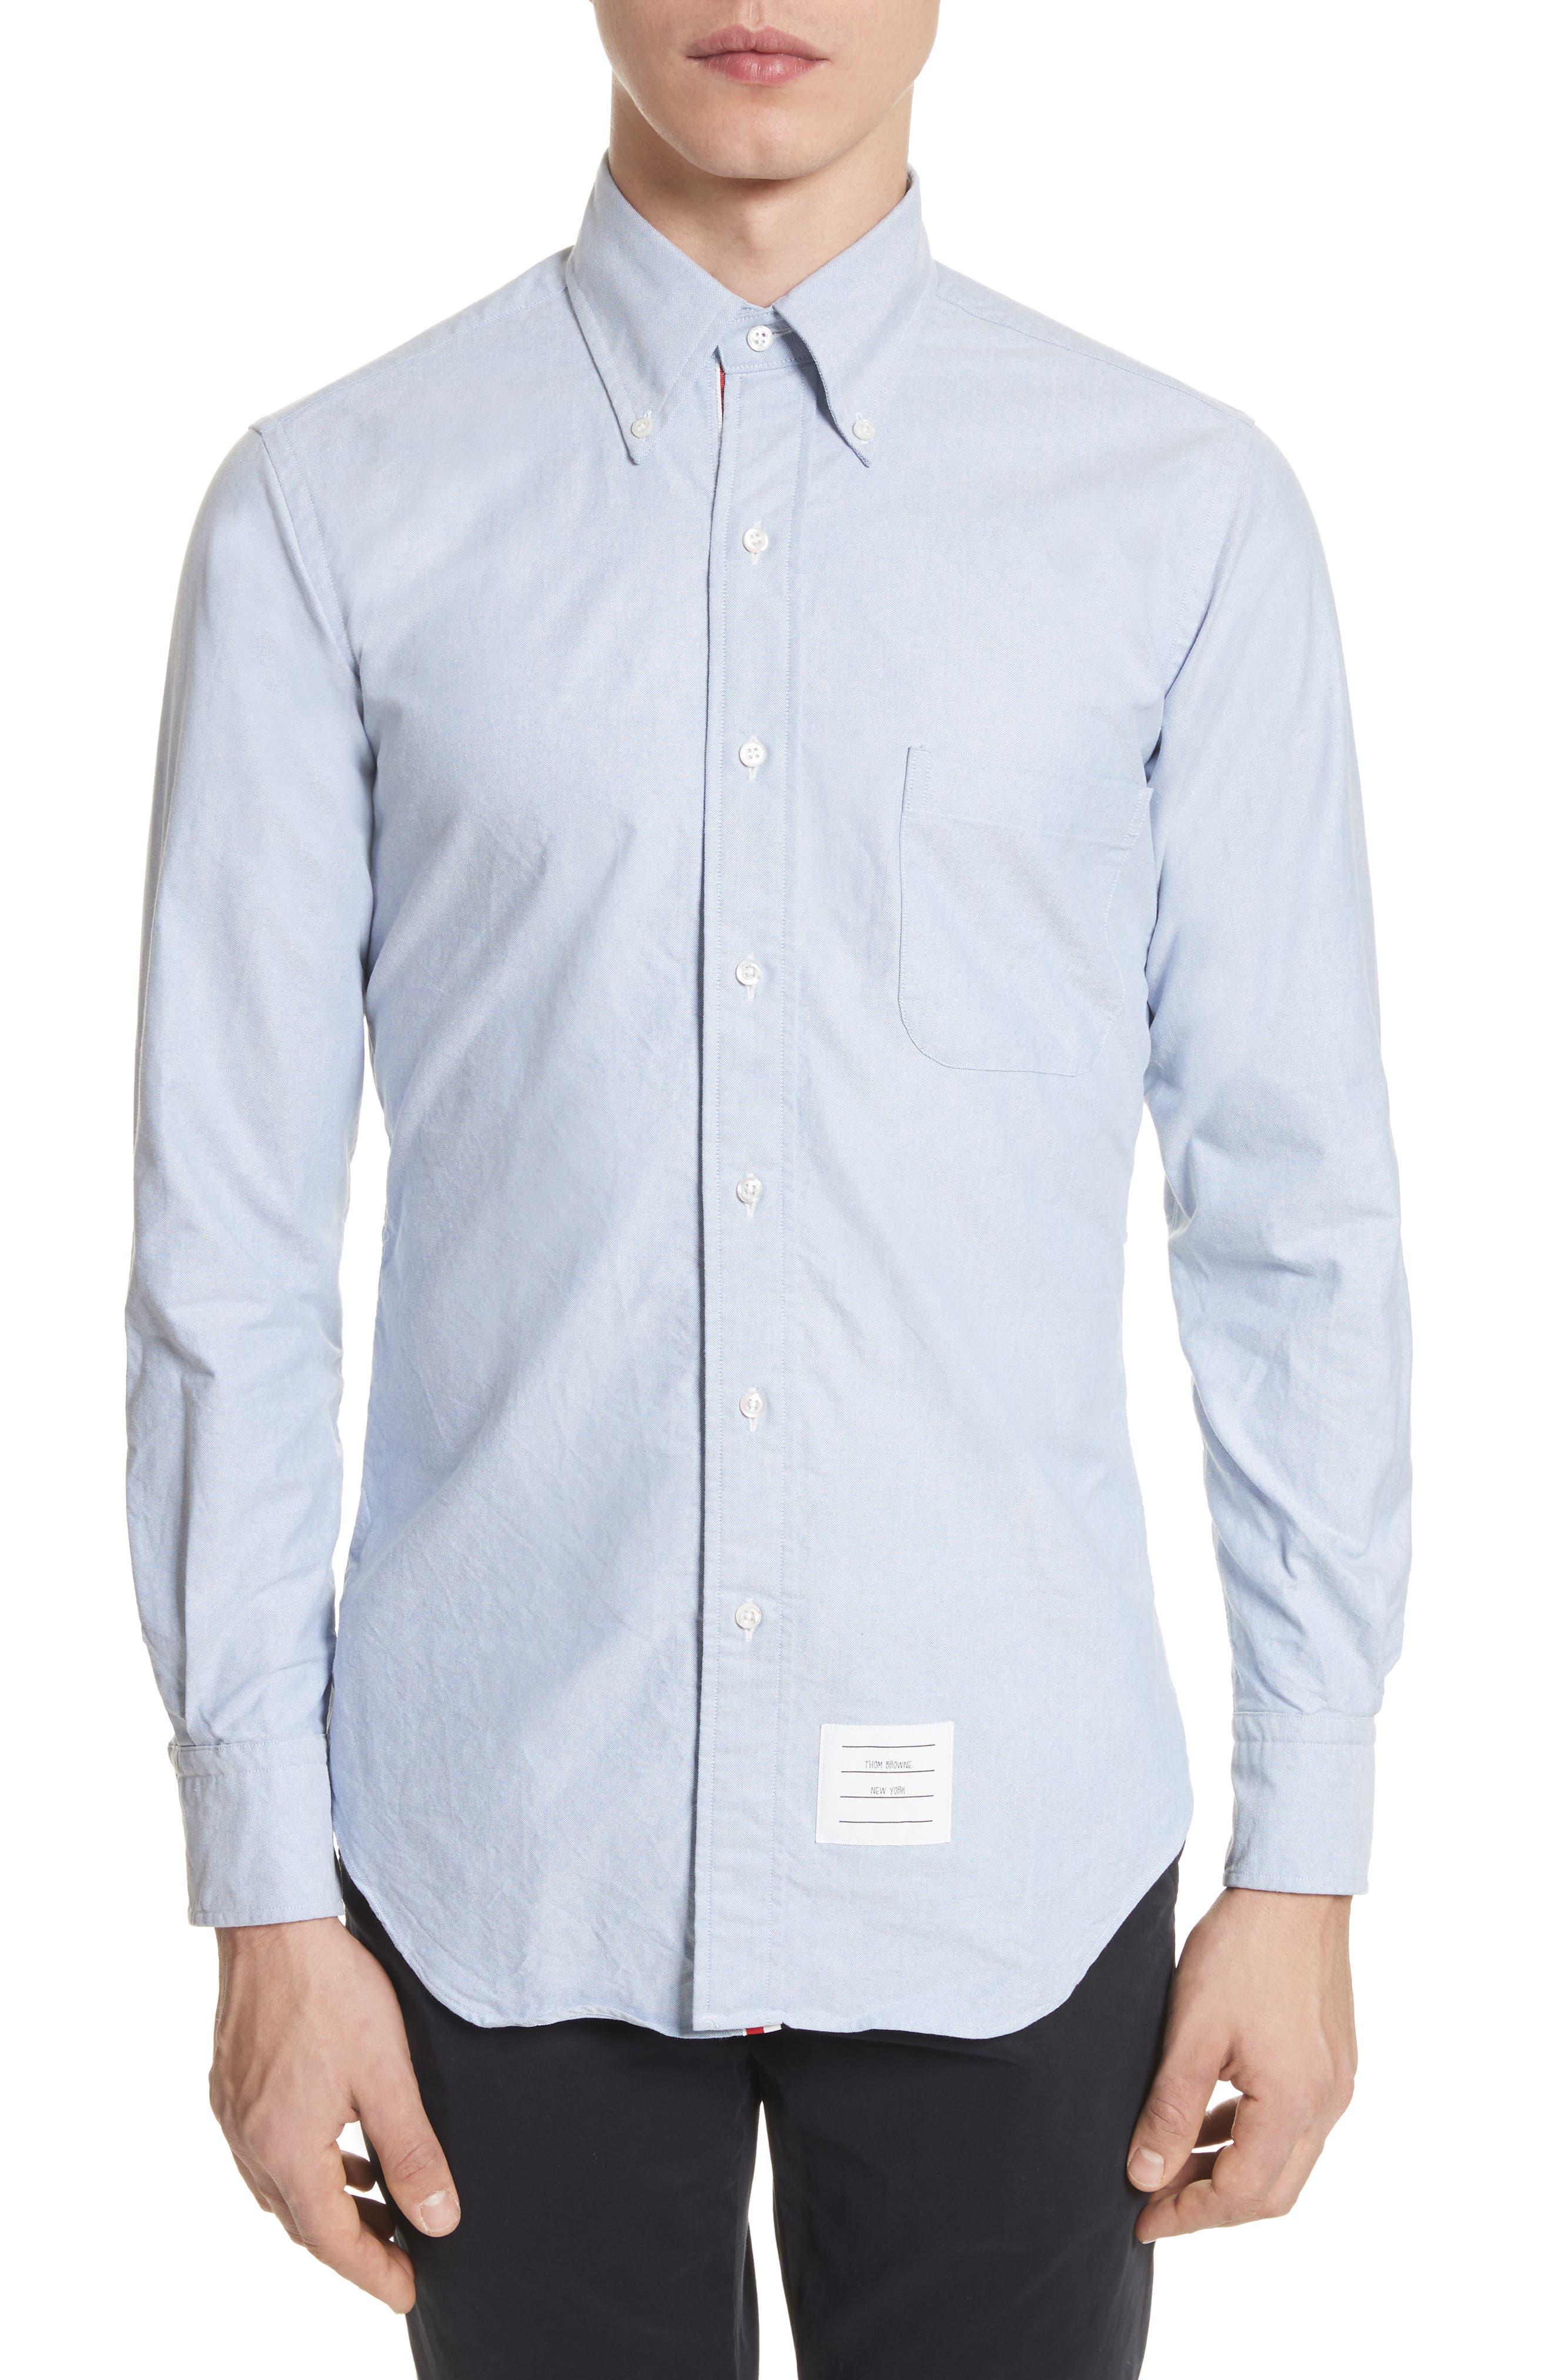 Extra Trim Fit Oxford Shirt with Grosgrain Trim,                         Main,                         color, Light Blue